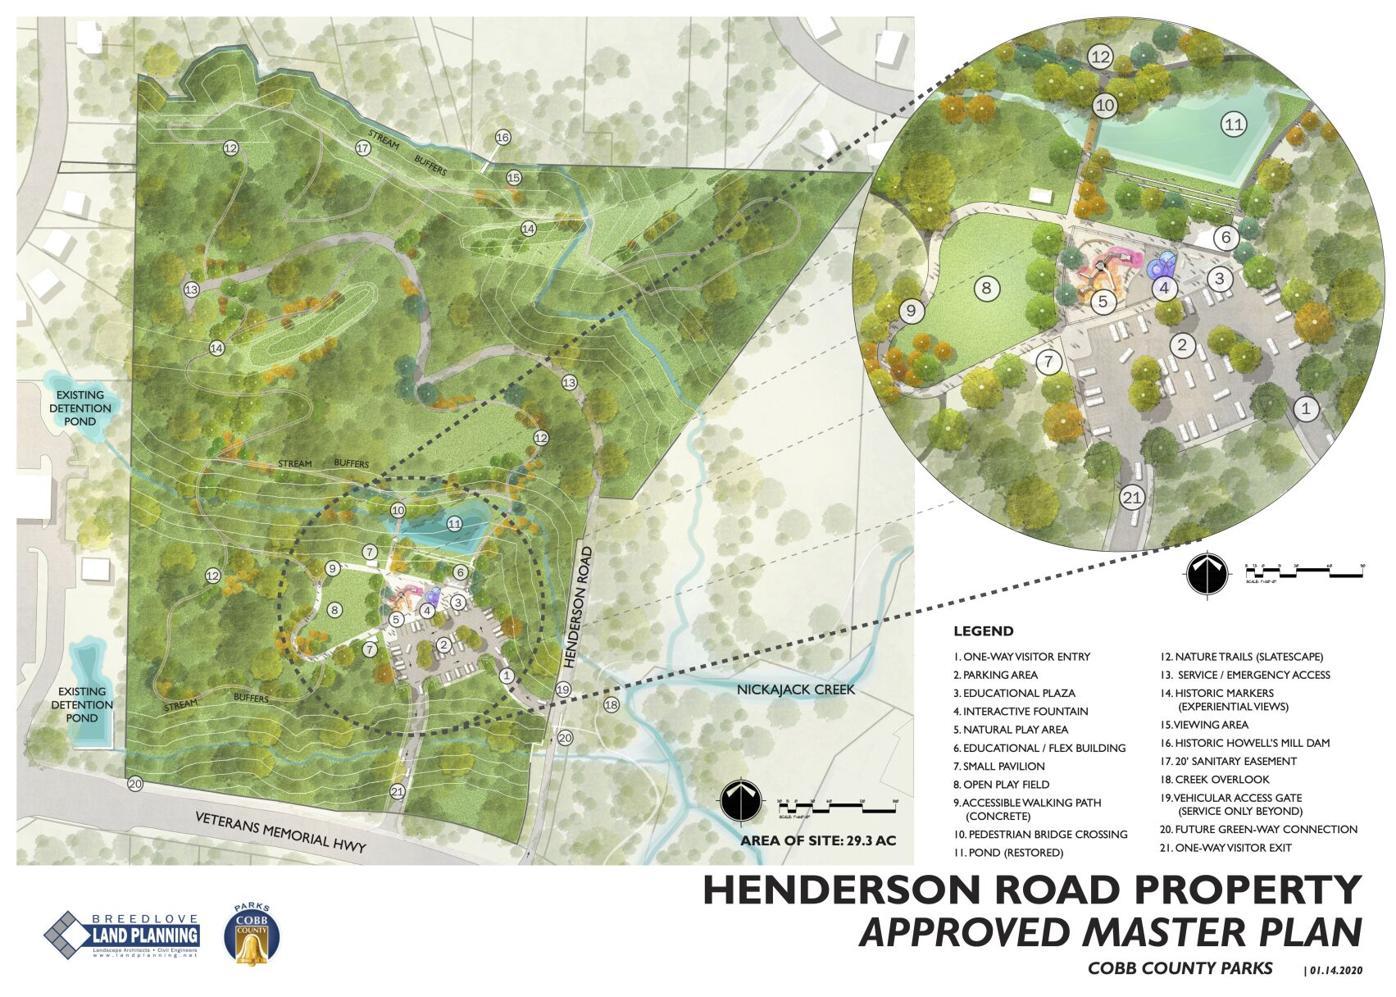 Henderson Road Property - Approved Master Plan - 011420.jpg